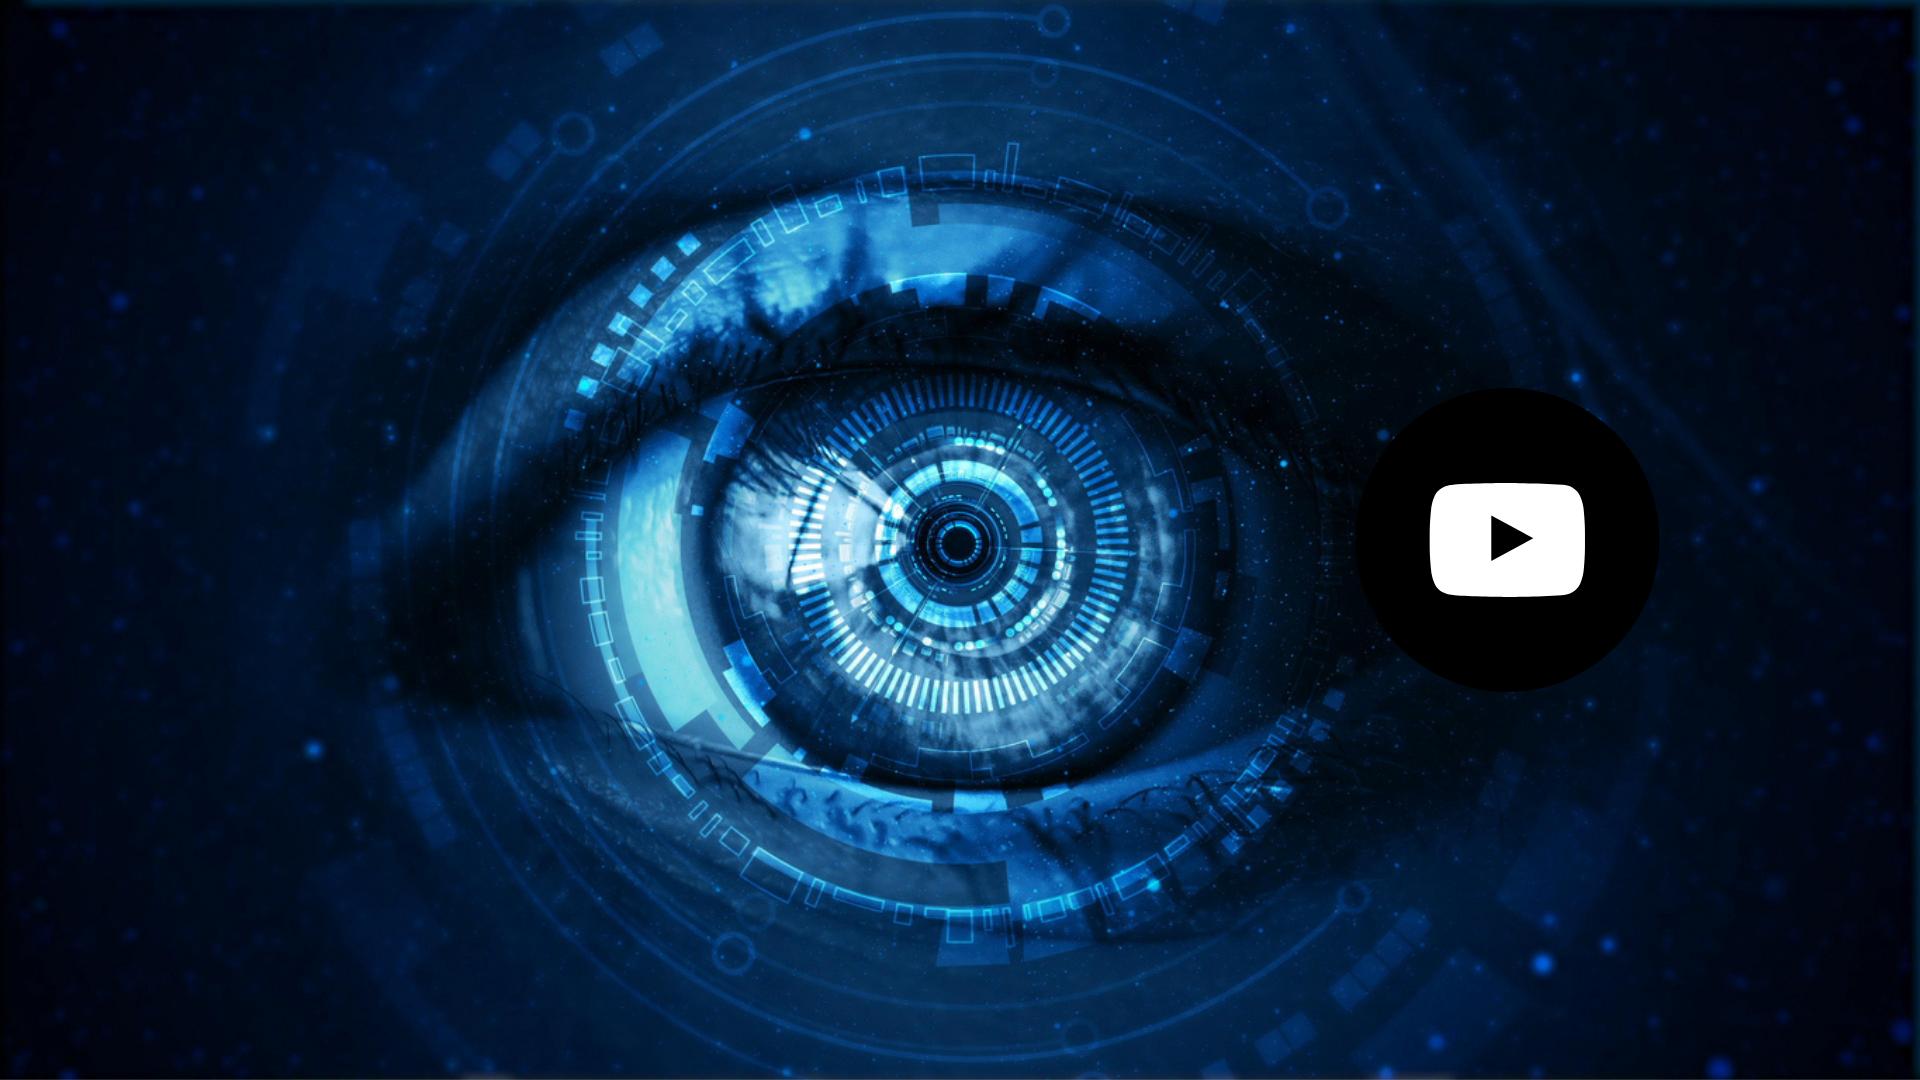 dreyev | Computer vision